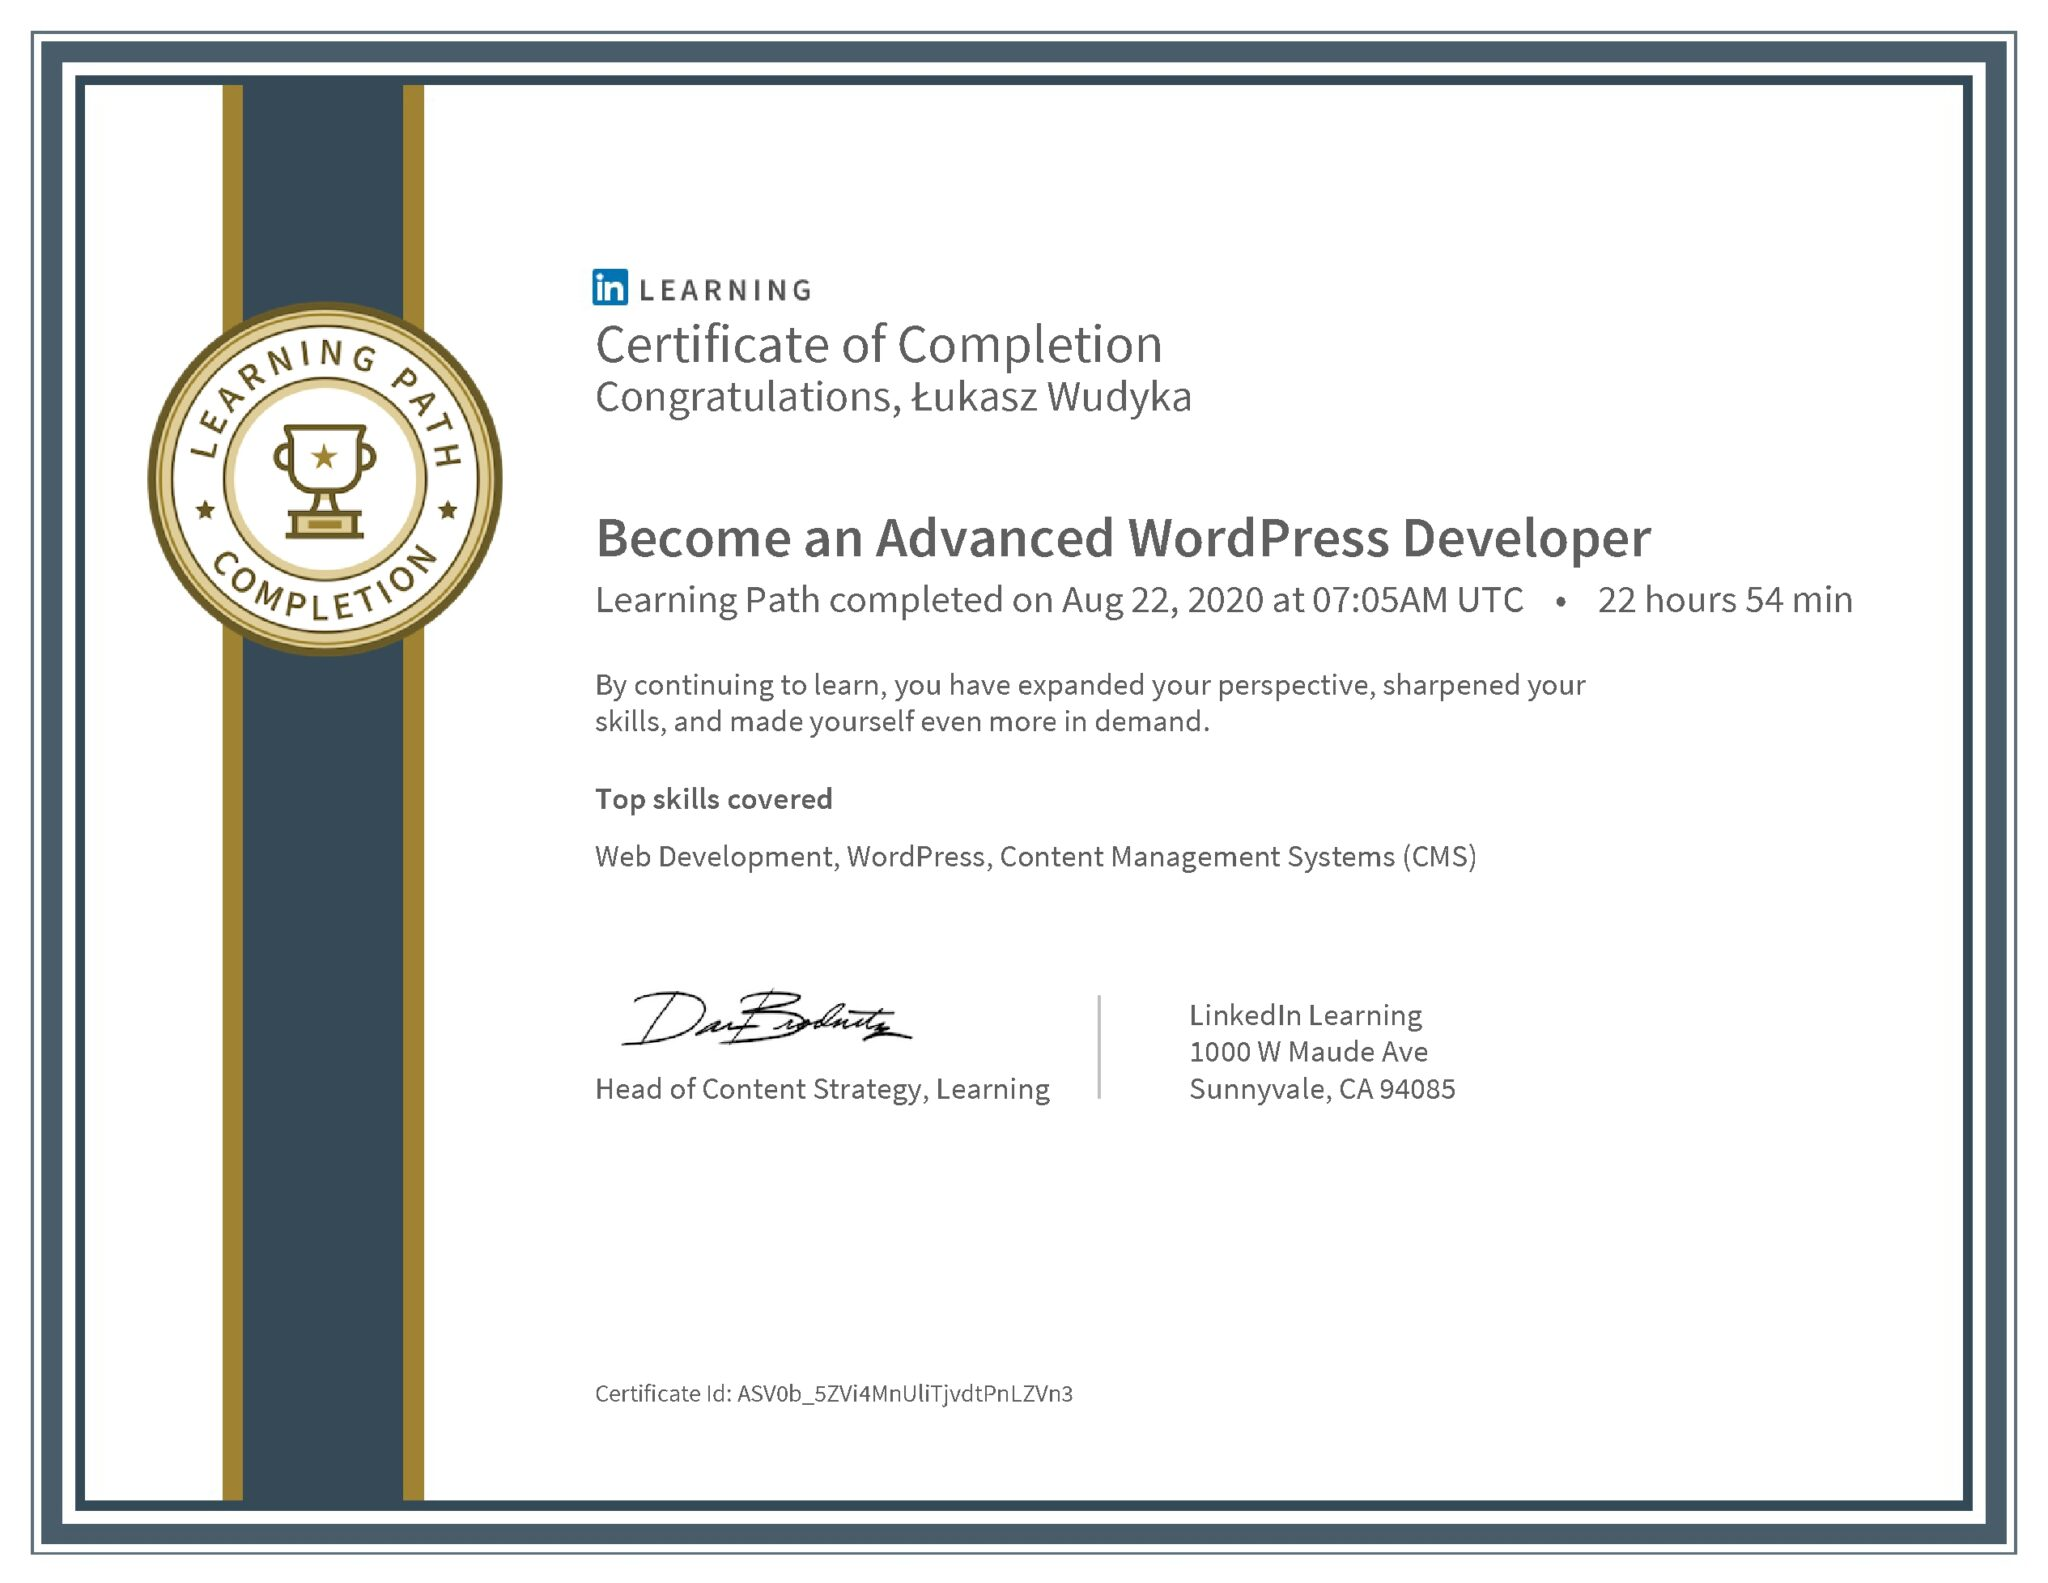 Łukasz Wudyka certyfikat LinkedIn Become an Advanced WordPress Developer